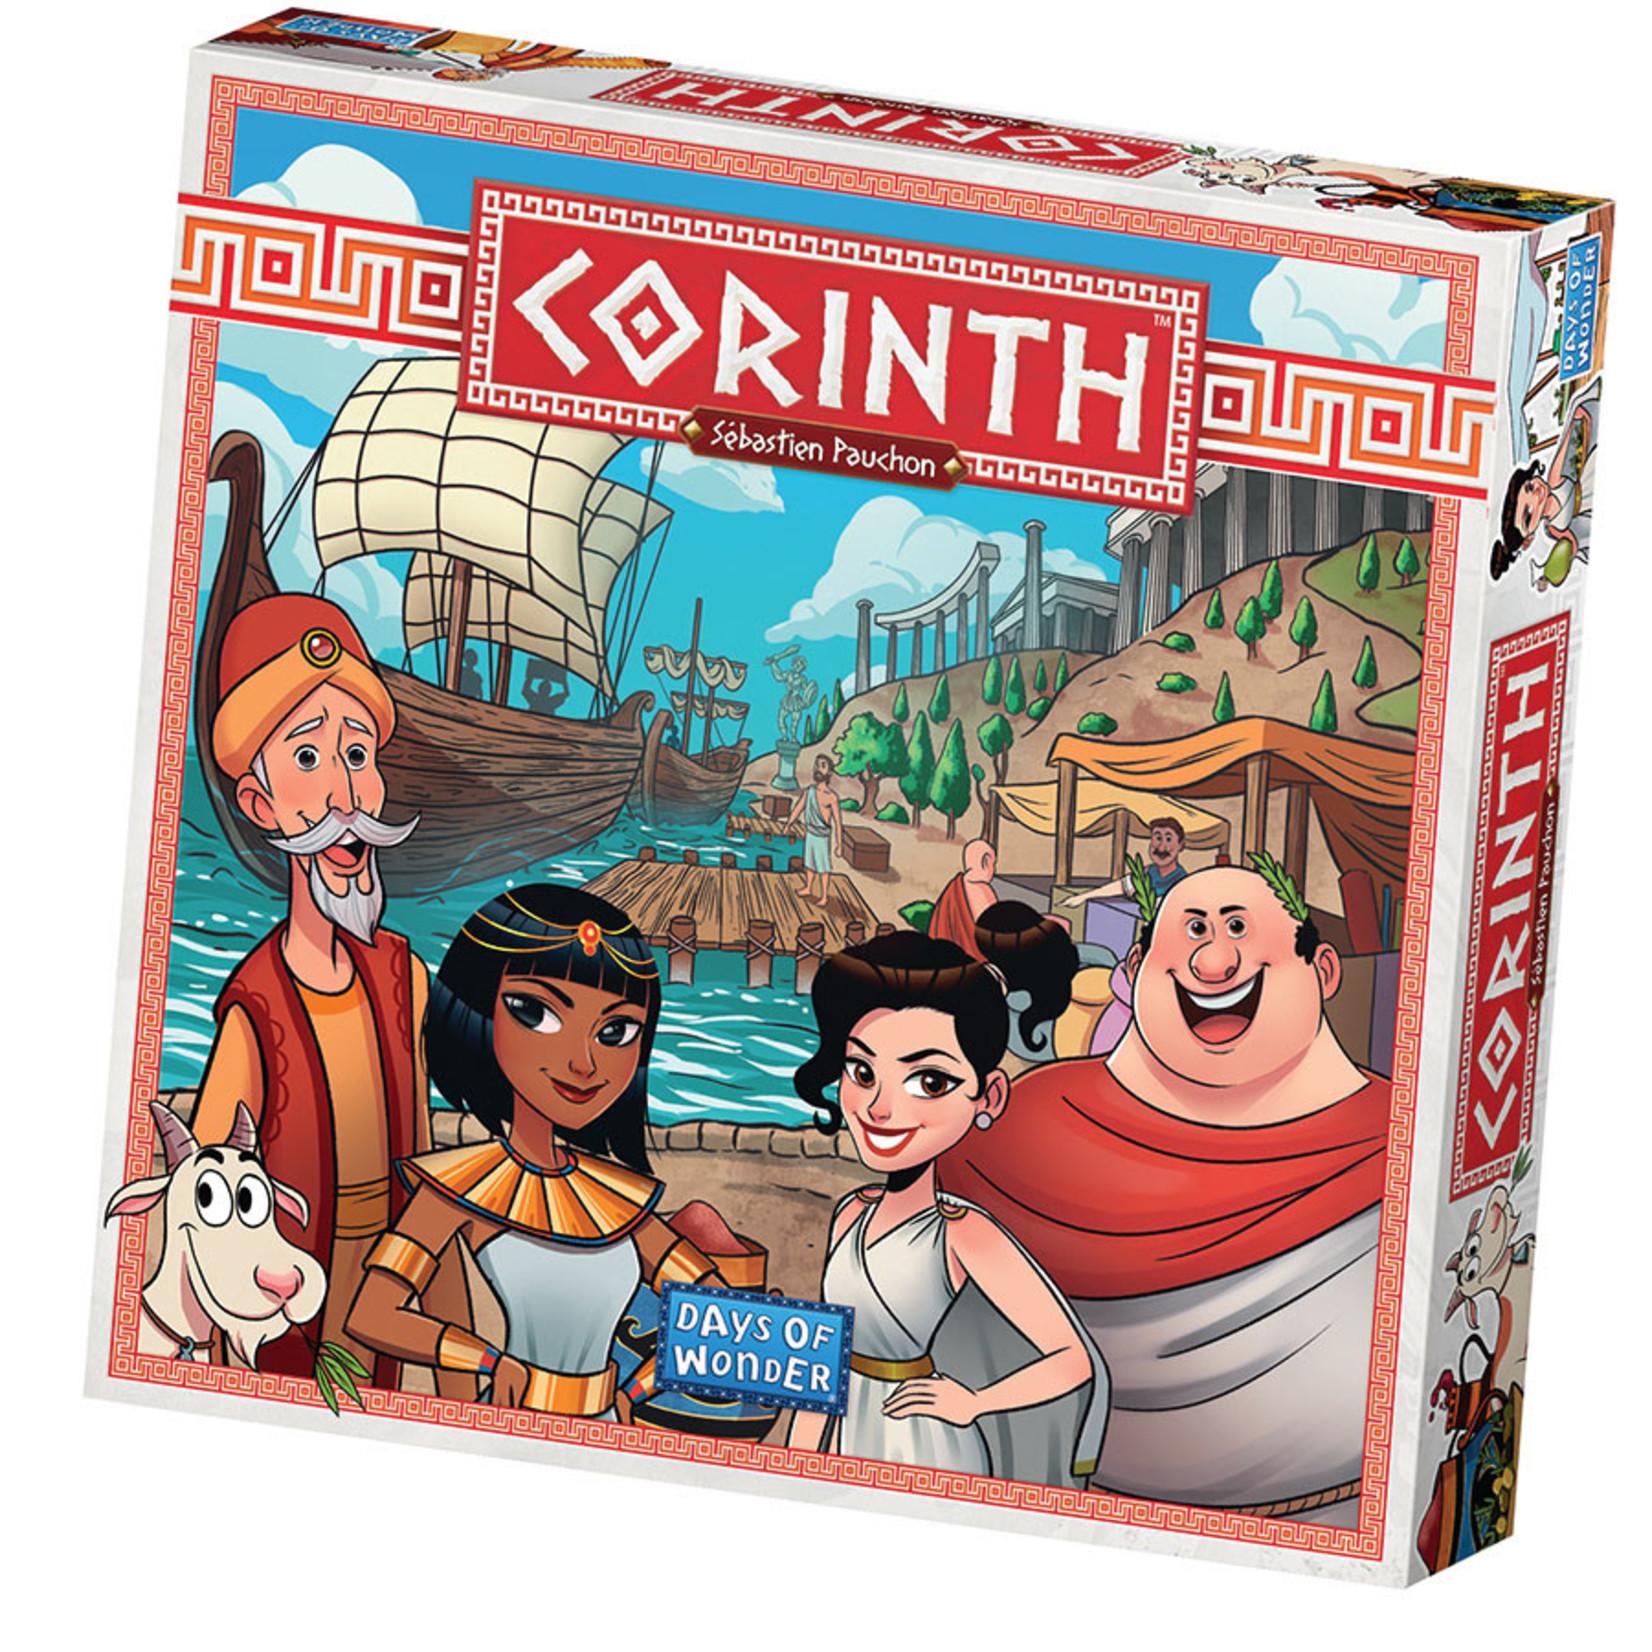 Days of Wonder Corinth